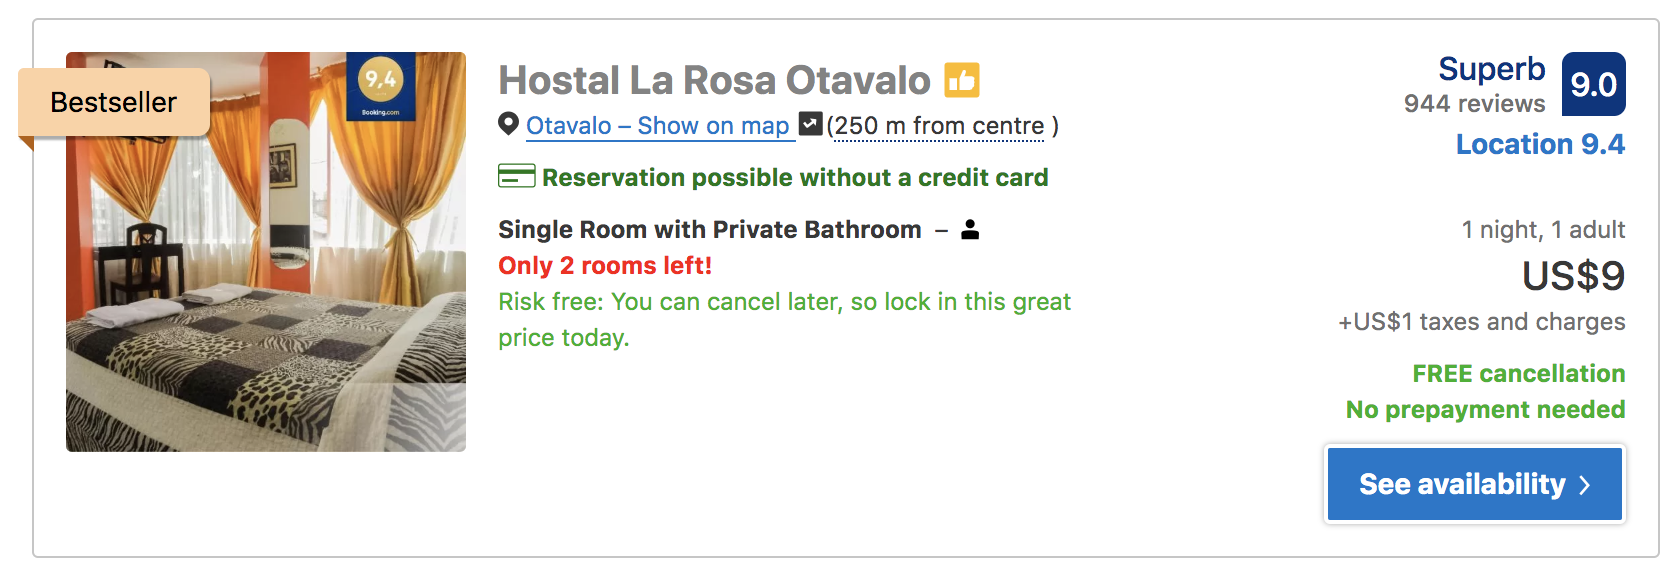 where to stay in otavalo hostal la rosa